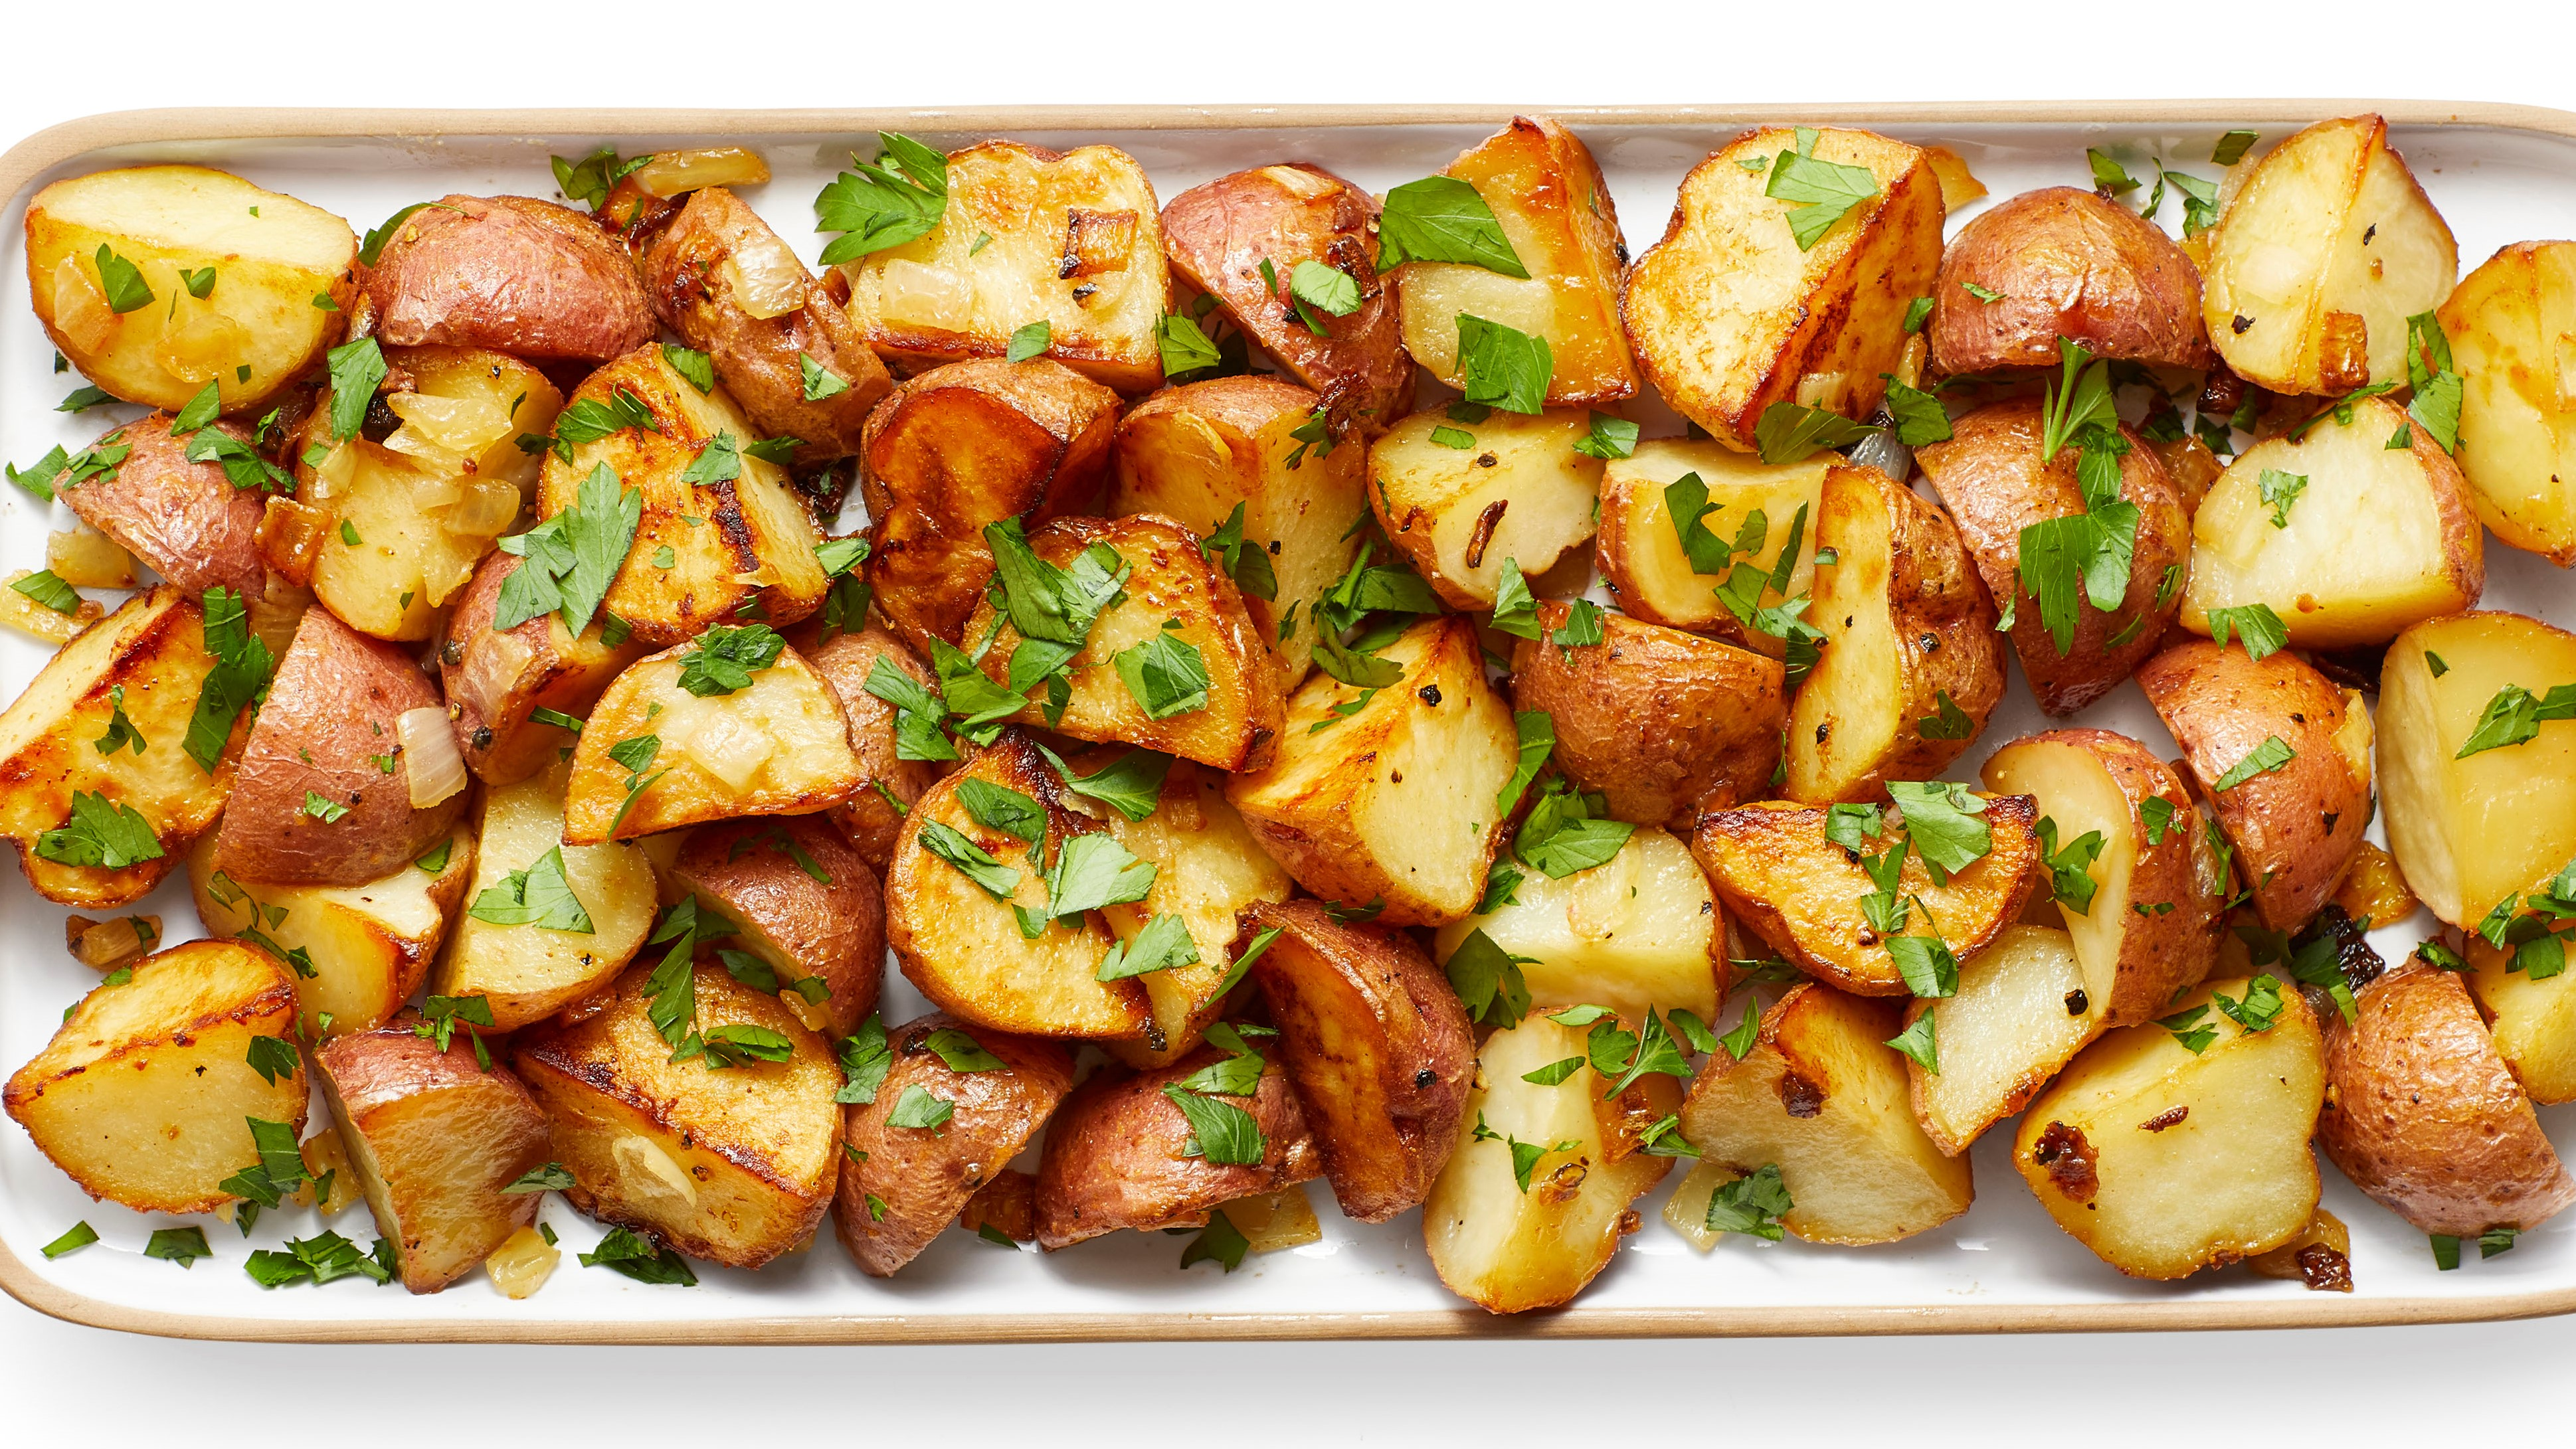 Honey-Roasted Red Potatoes